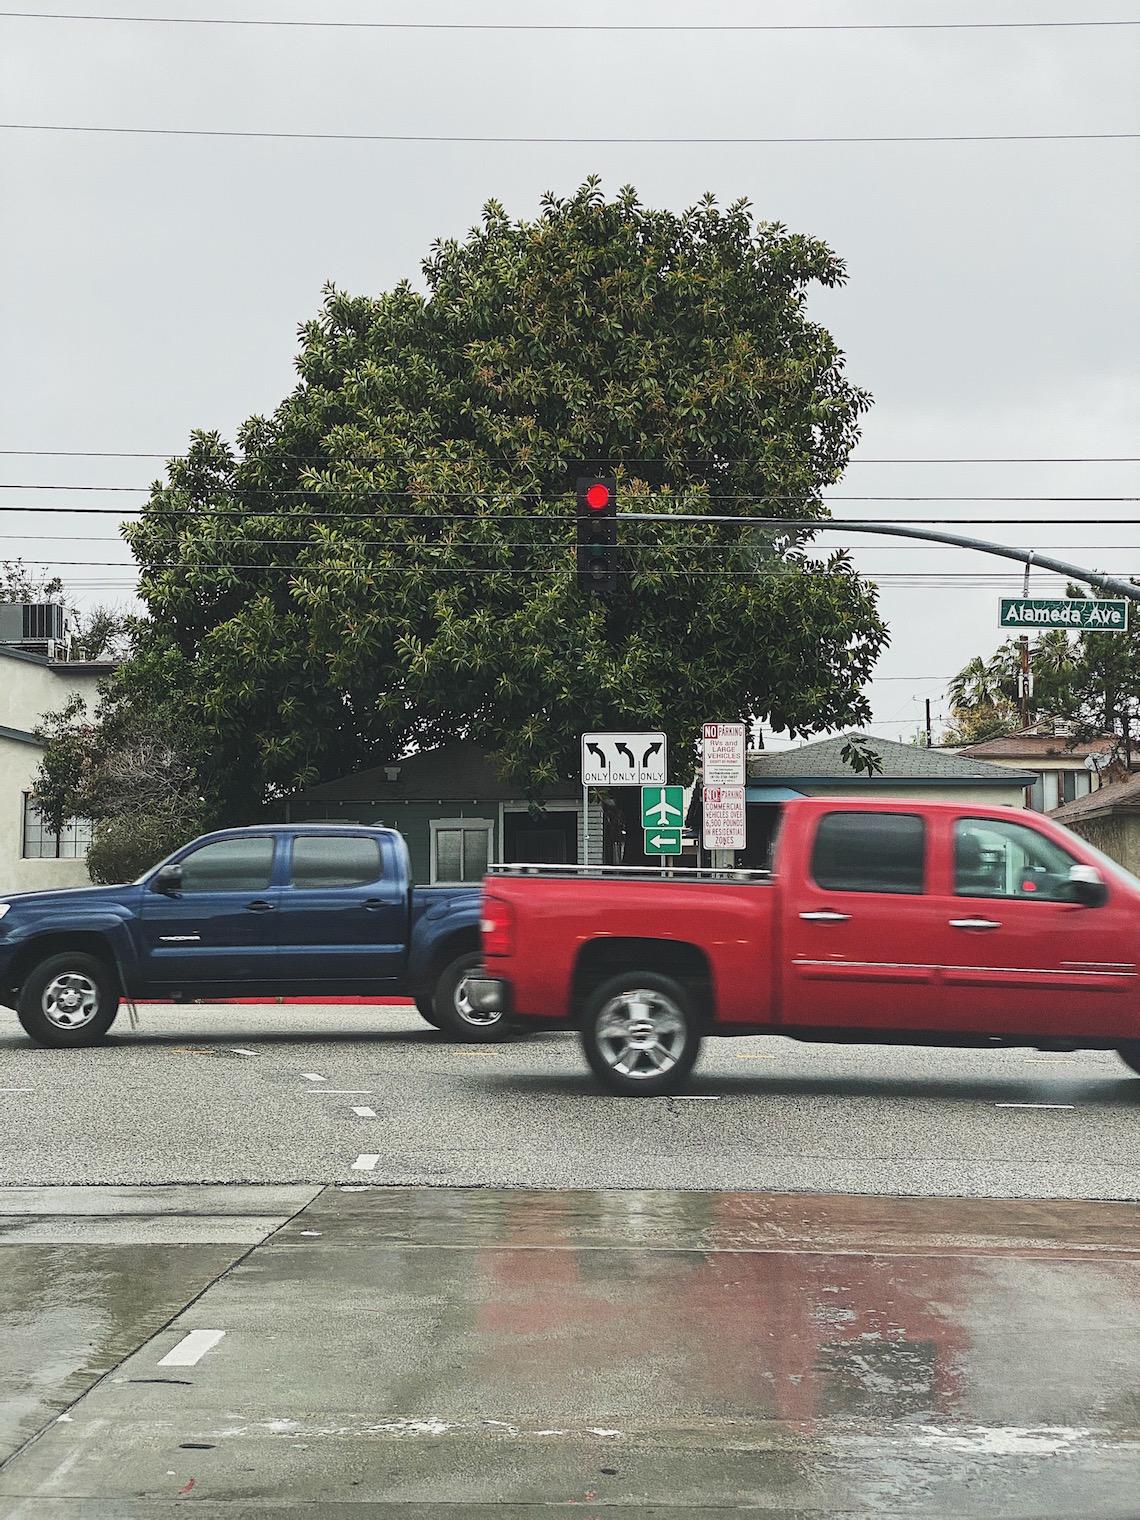 red light-road-rain-trucks-driving-gods grace